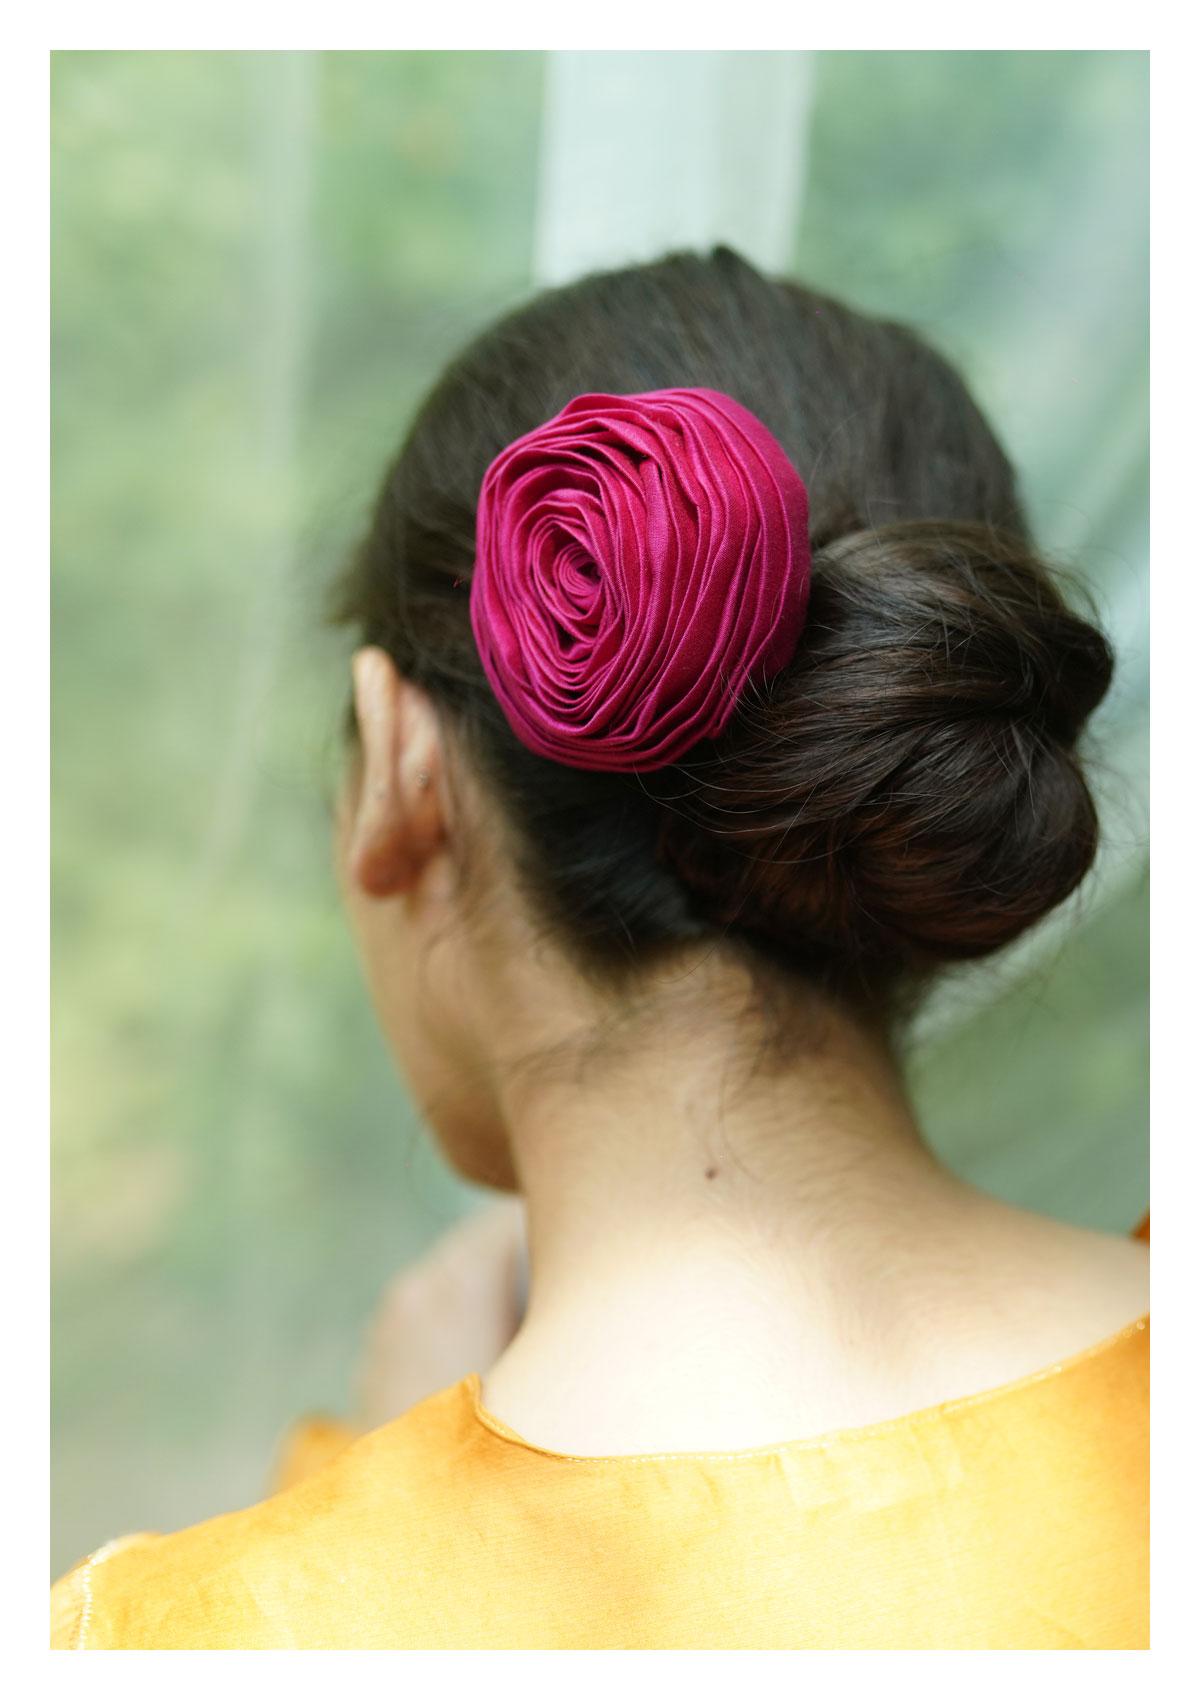 Gulabi Handmade Textile Accessory